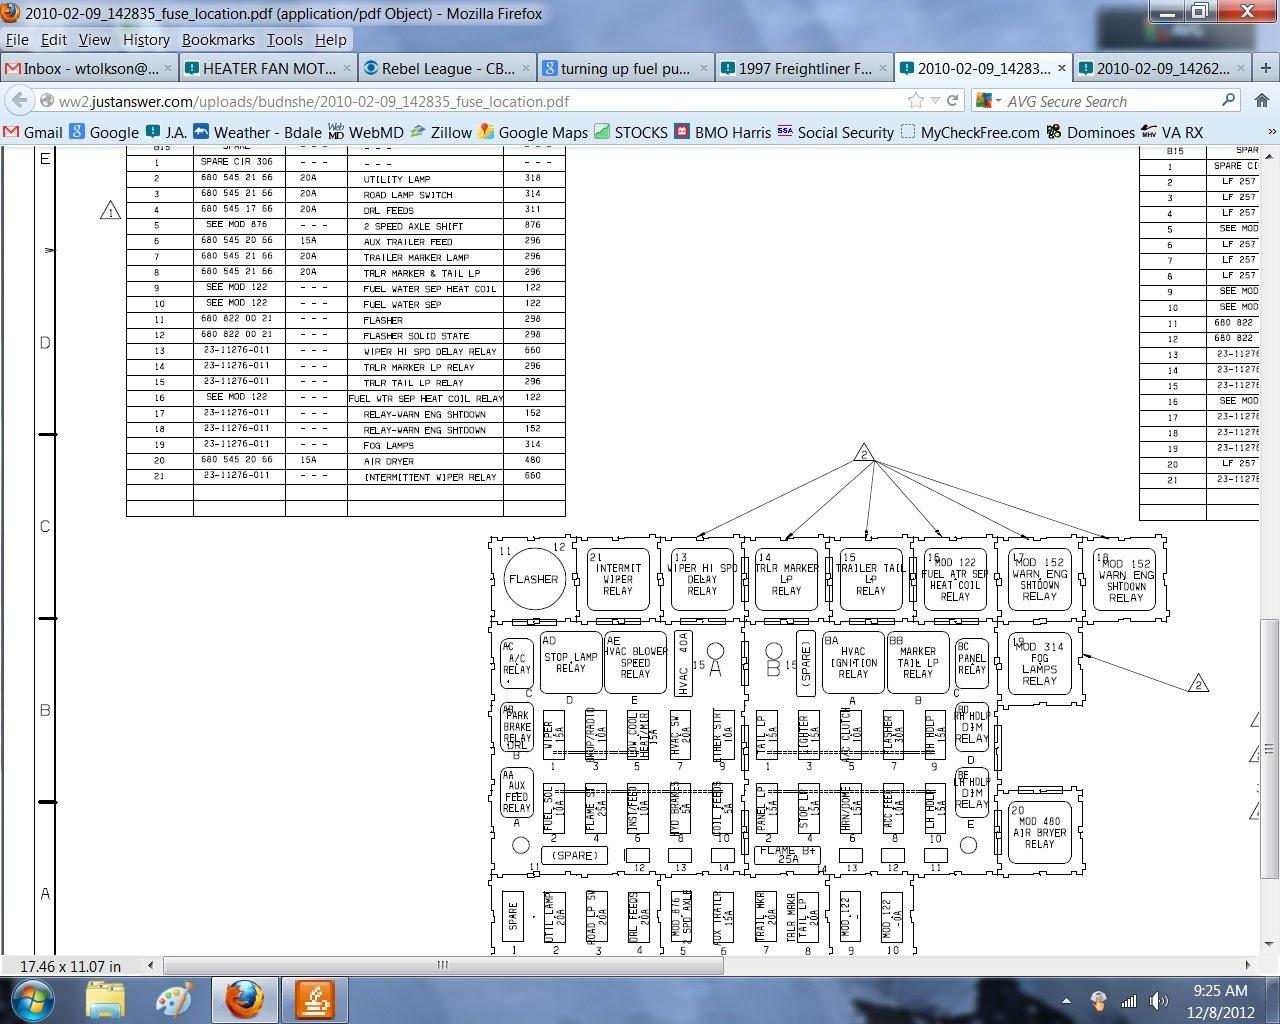 2001 freightliner fl80 wiring diagram free picture 2000 fl80 fuse box diagram e3 wiring diagram  2000 fl80 fuse box diagram e3 wiring